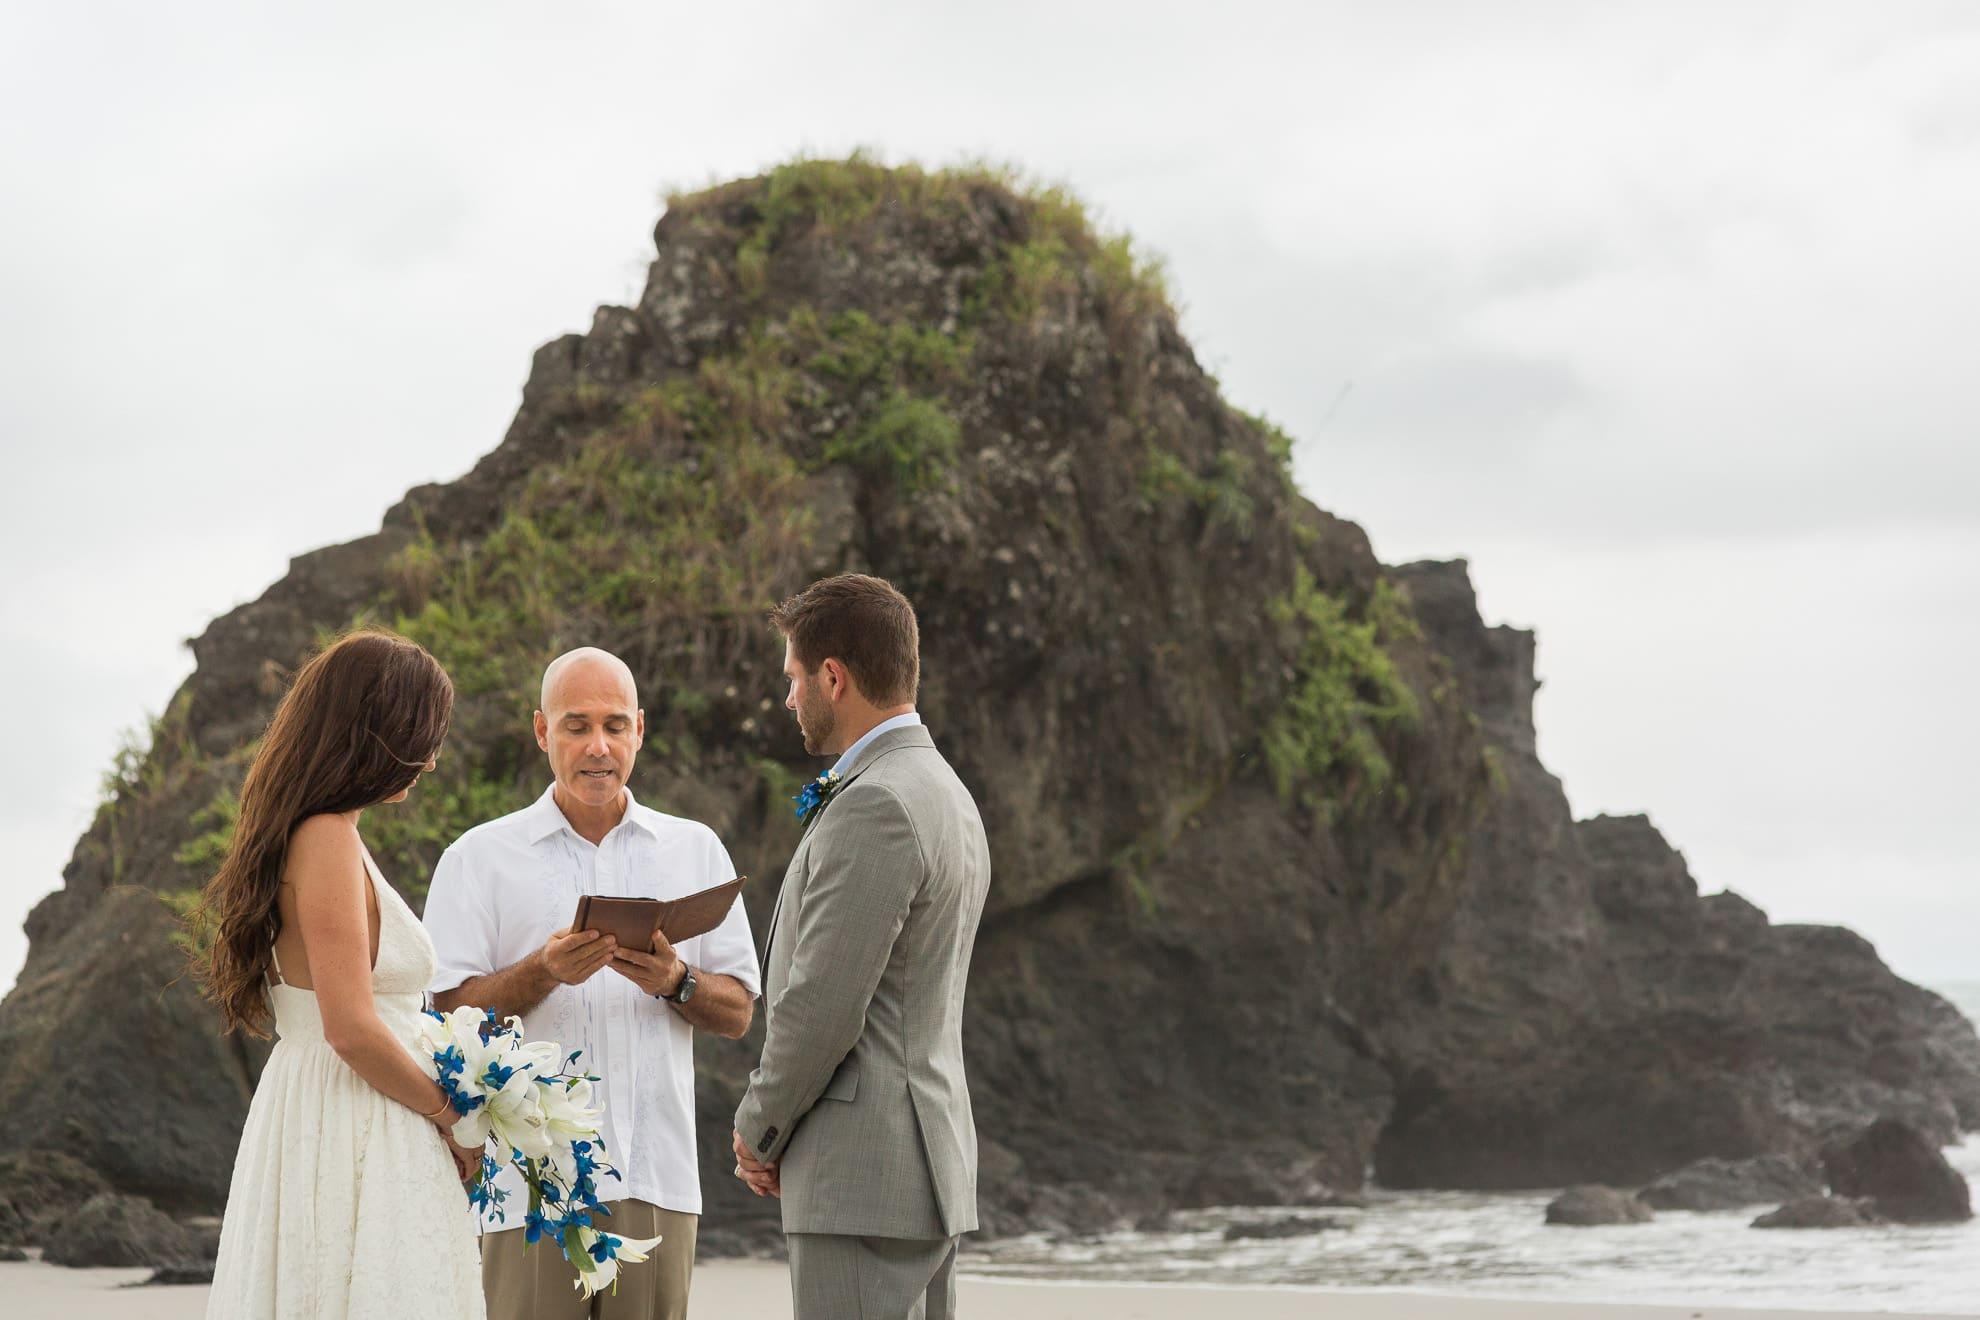 Small wedding in Costa Rica